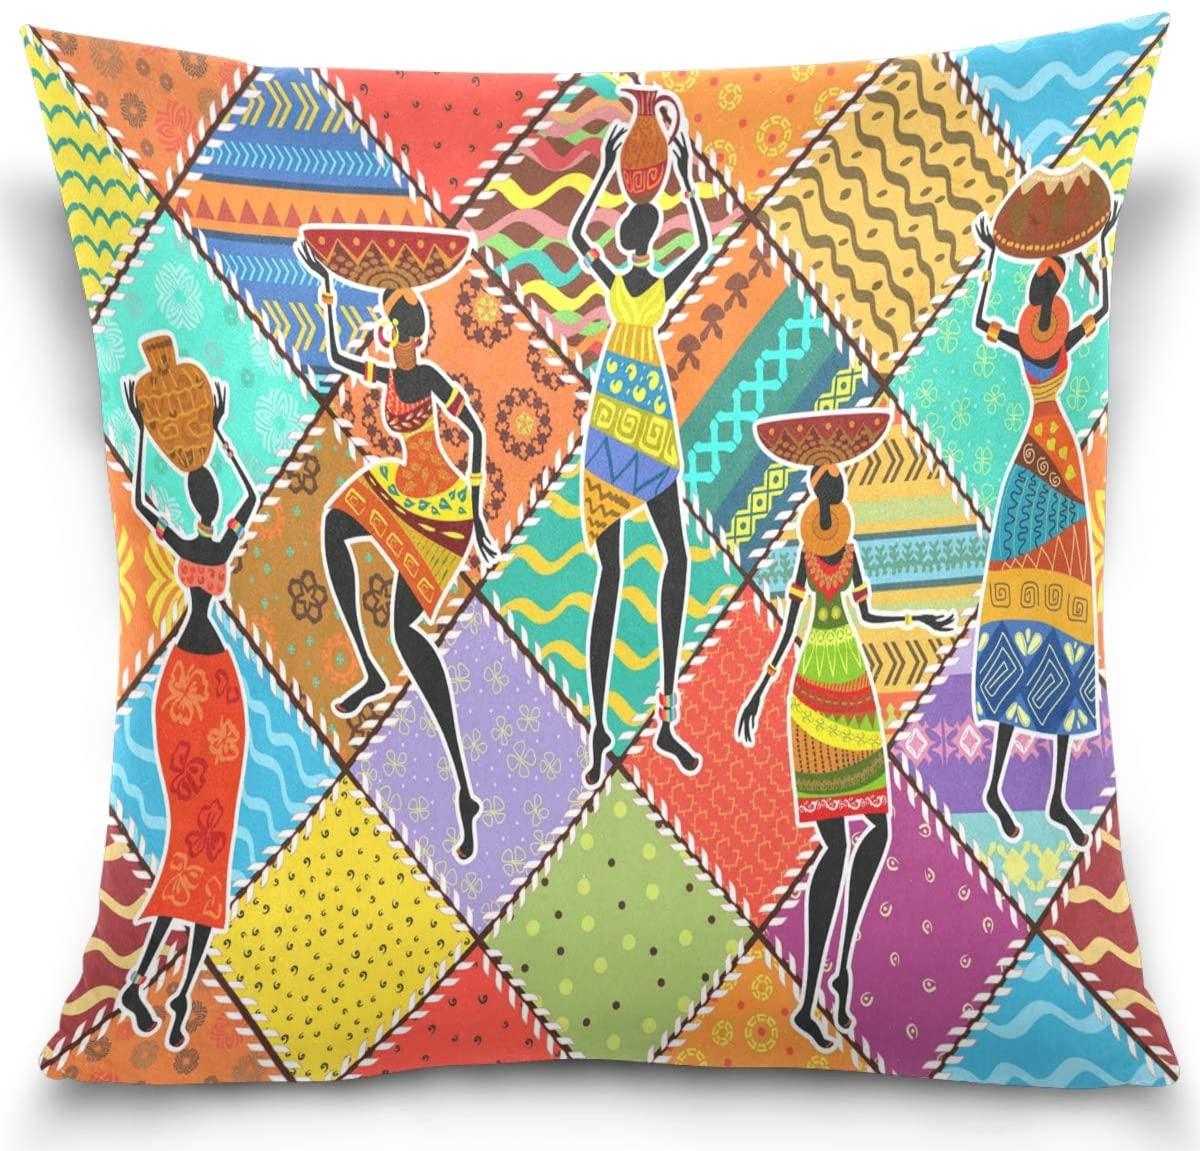 Kaariok African Black Women Colorful Plaids Throw Pillow Cases, Square Decorative Pillowcase Cushion Cover 16